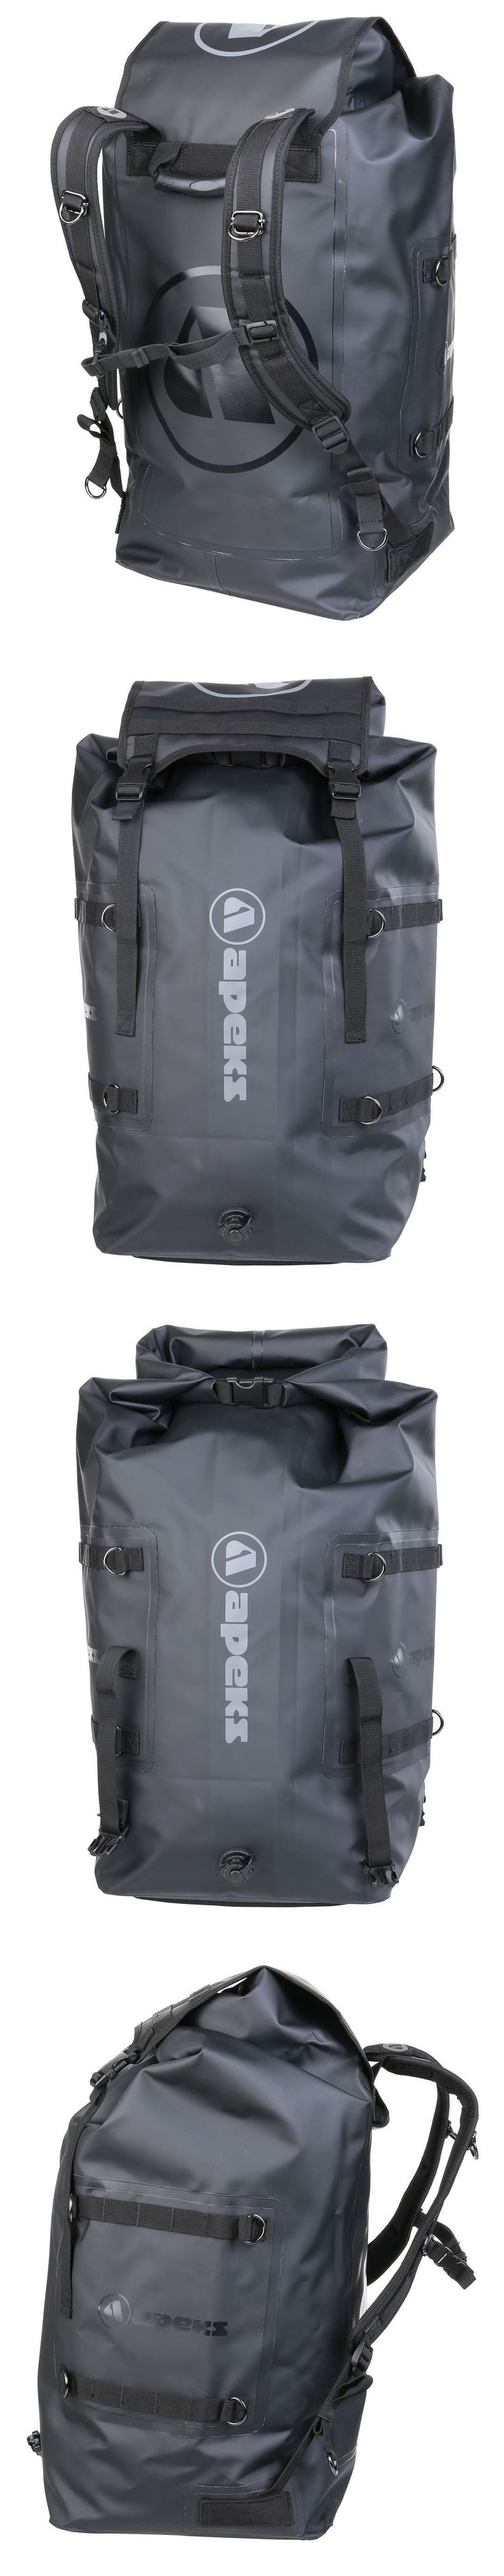 Gear Bags 29576: Apeks Dry 75 Twin Core Dry Bag Scuba Gear Backpack BUY IT NOW ONLY: $180.0 #scubadivingequipment #scubadivingadventures